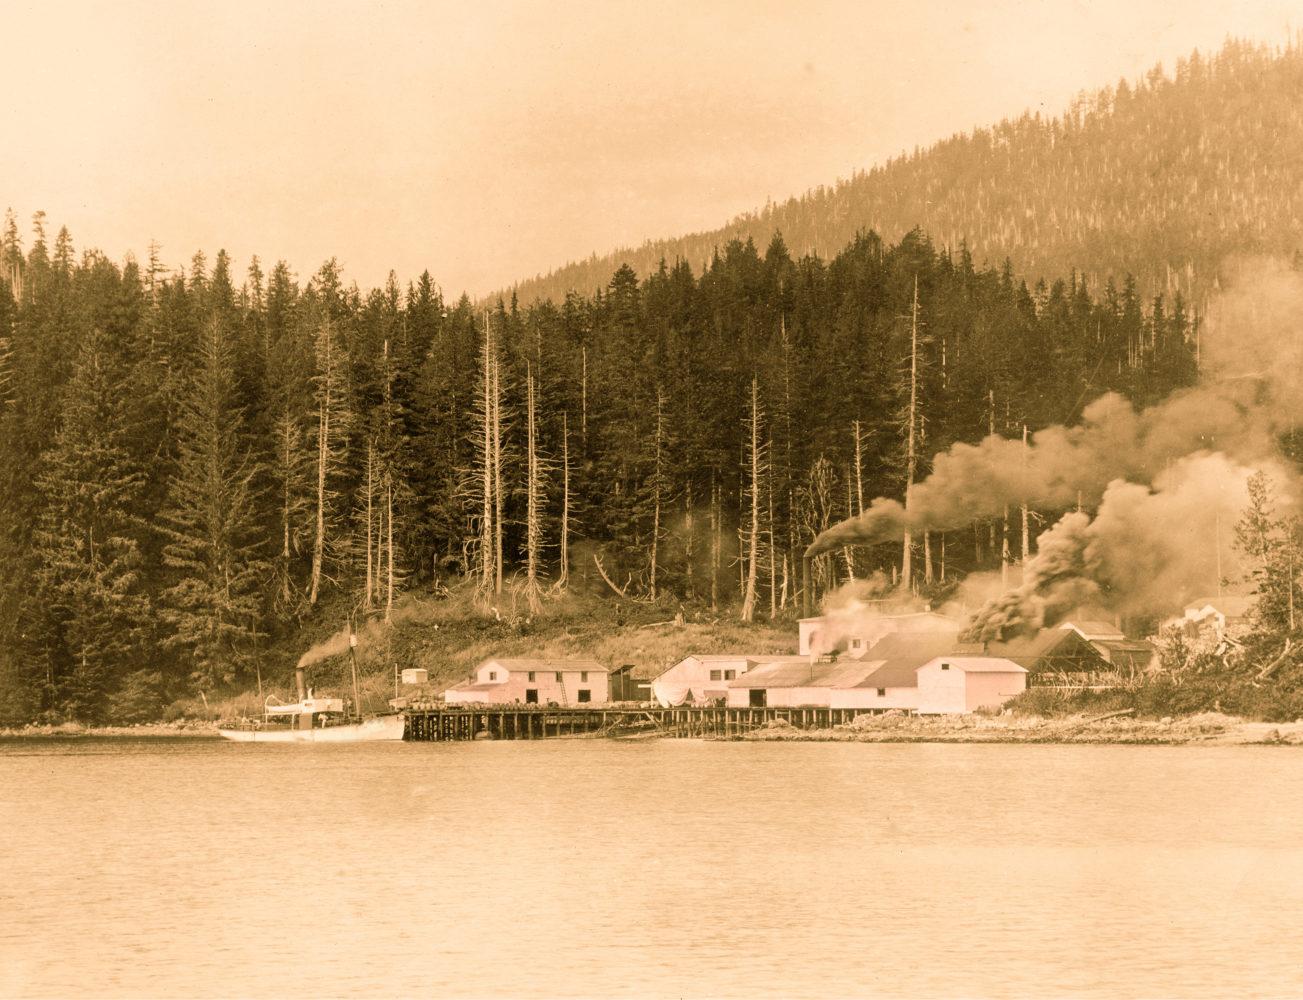 #14 - Sechart Whaling Station, circa 1905